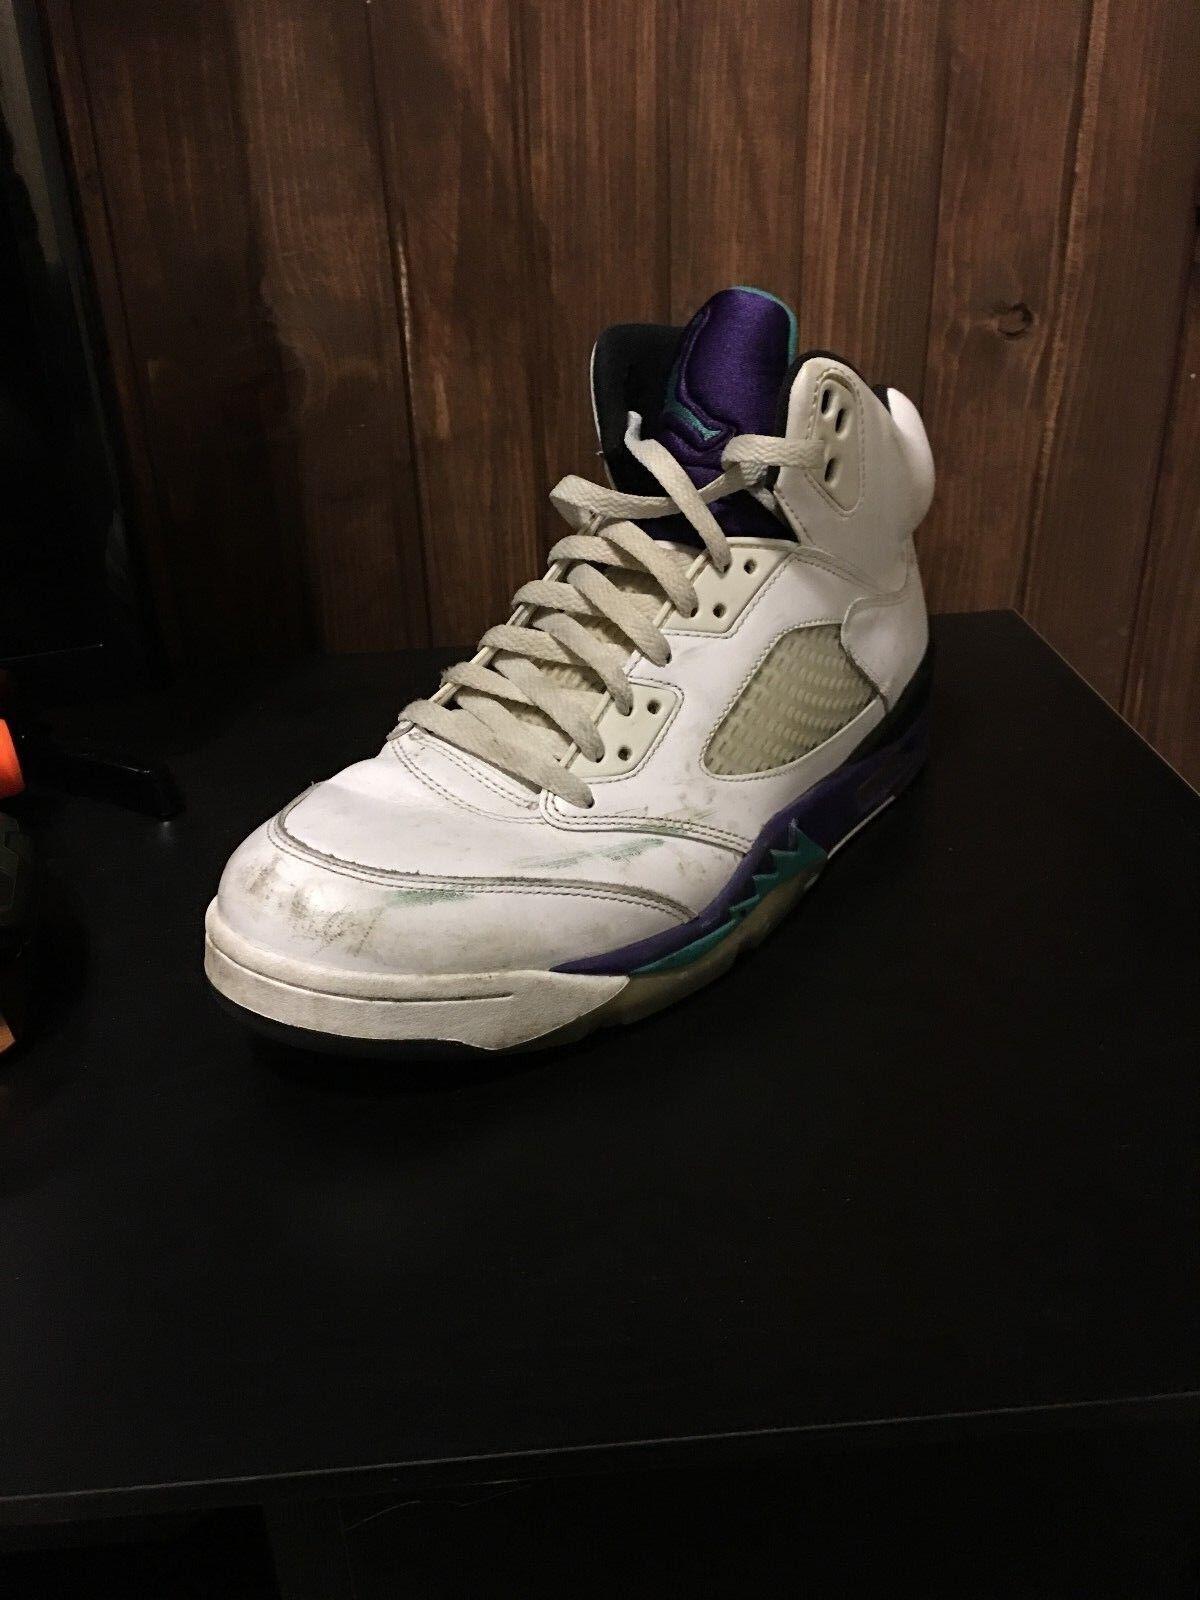 Nike Air Jordan 5 Grape 2018 Sz 10 Retro White RARE Casual wild